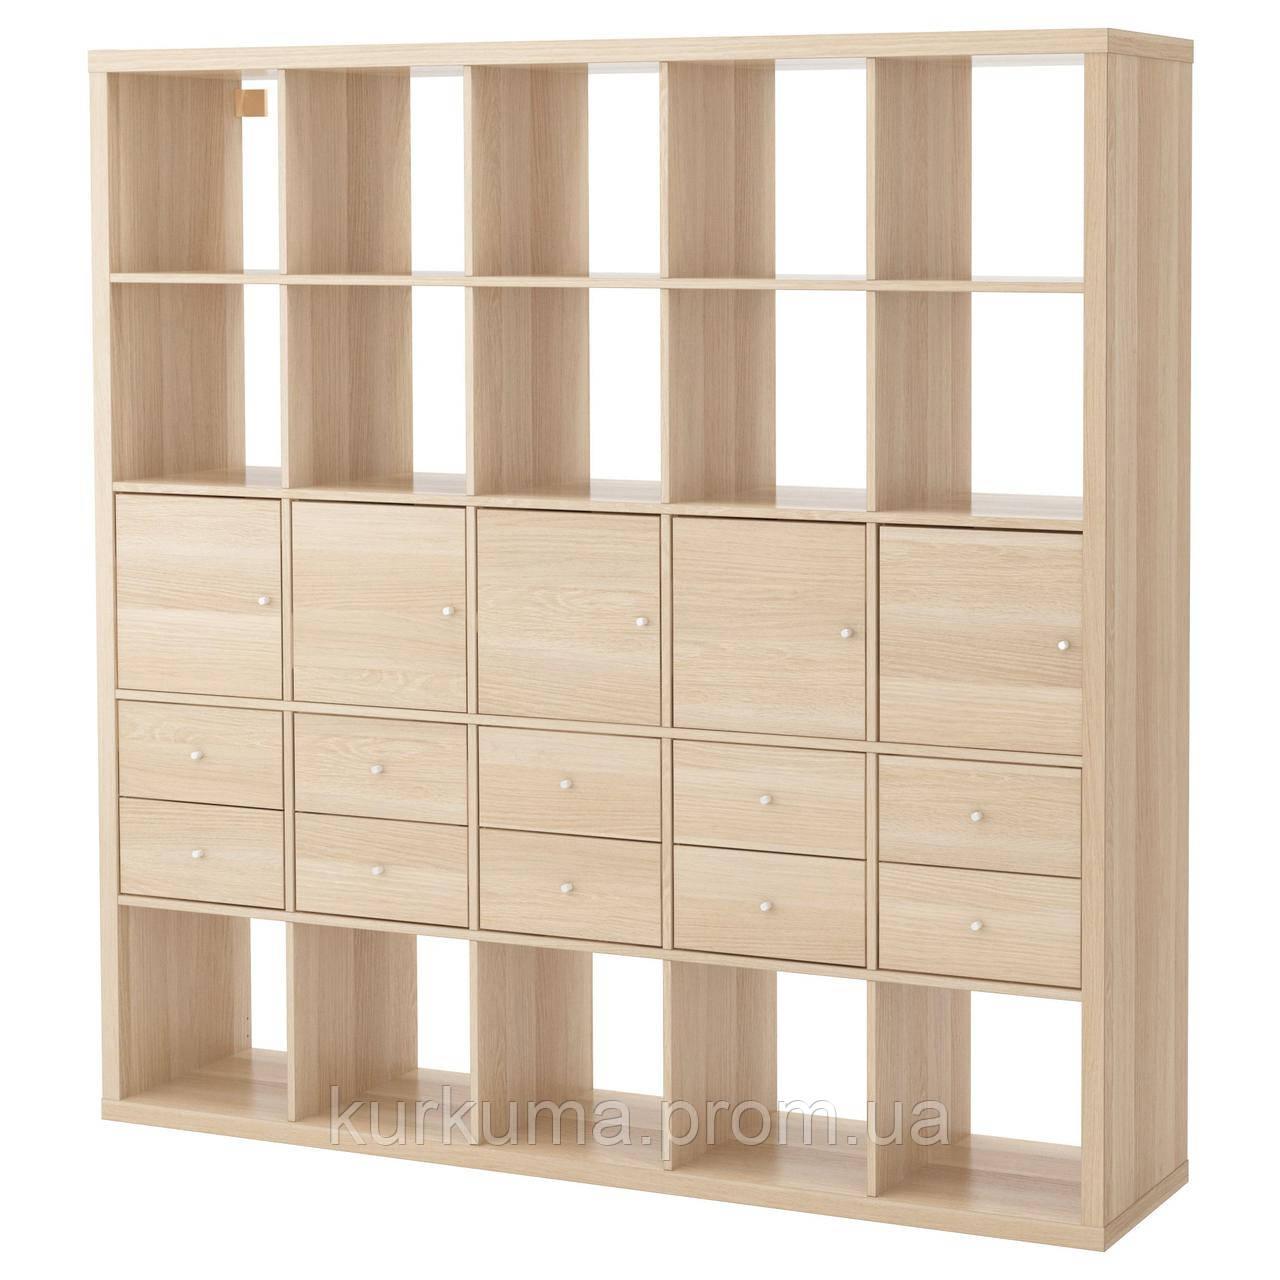 IKEA KALLAX Стеллаж с 10 дверями, дуб белый стаинедед  (091.976.05)